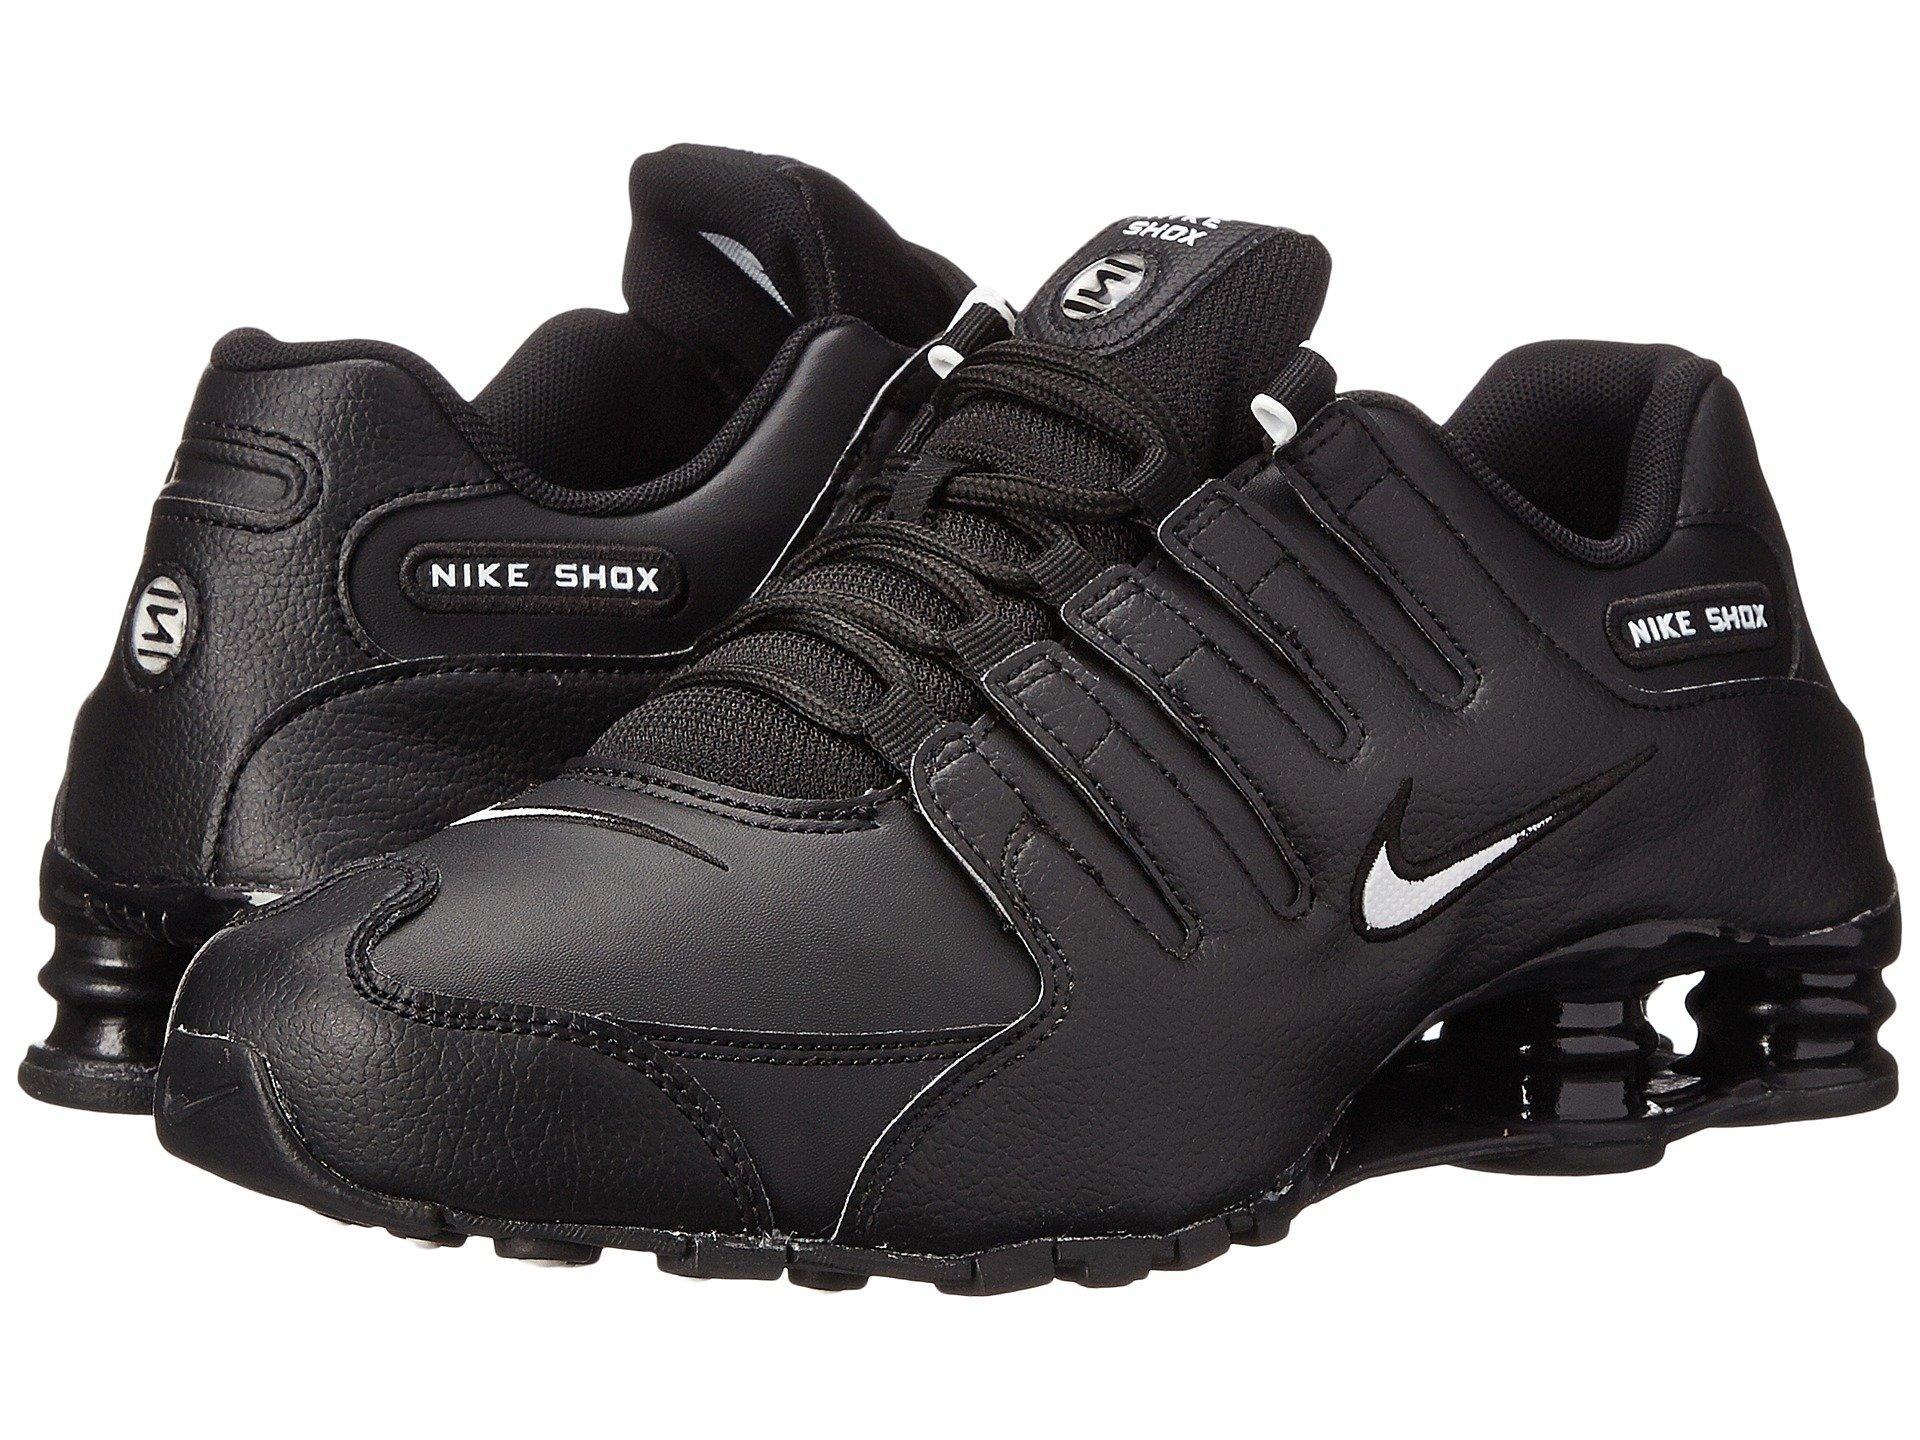 2ef9beb87dbb Lyst - Nike Shox Nz Eu (black white triple Black) Men s Running ...